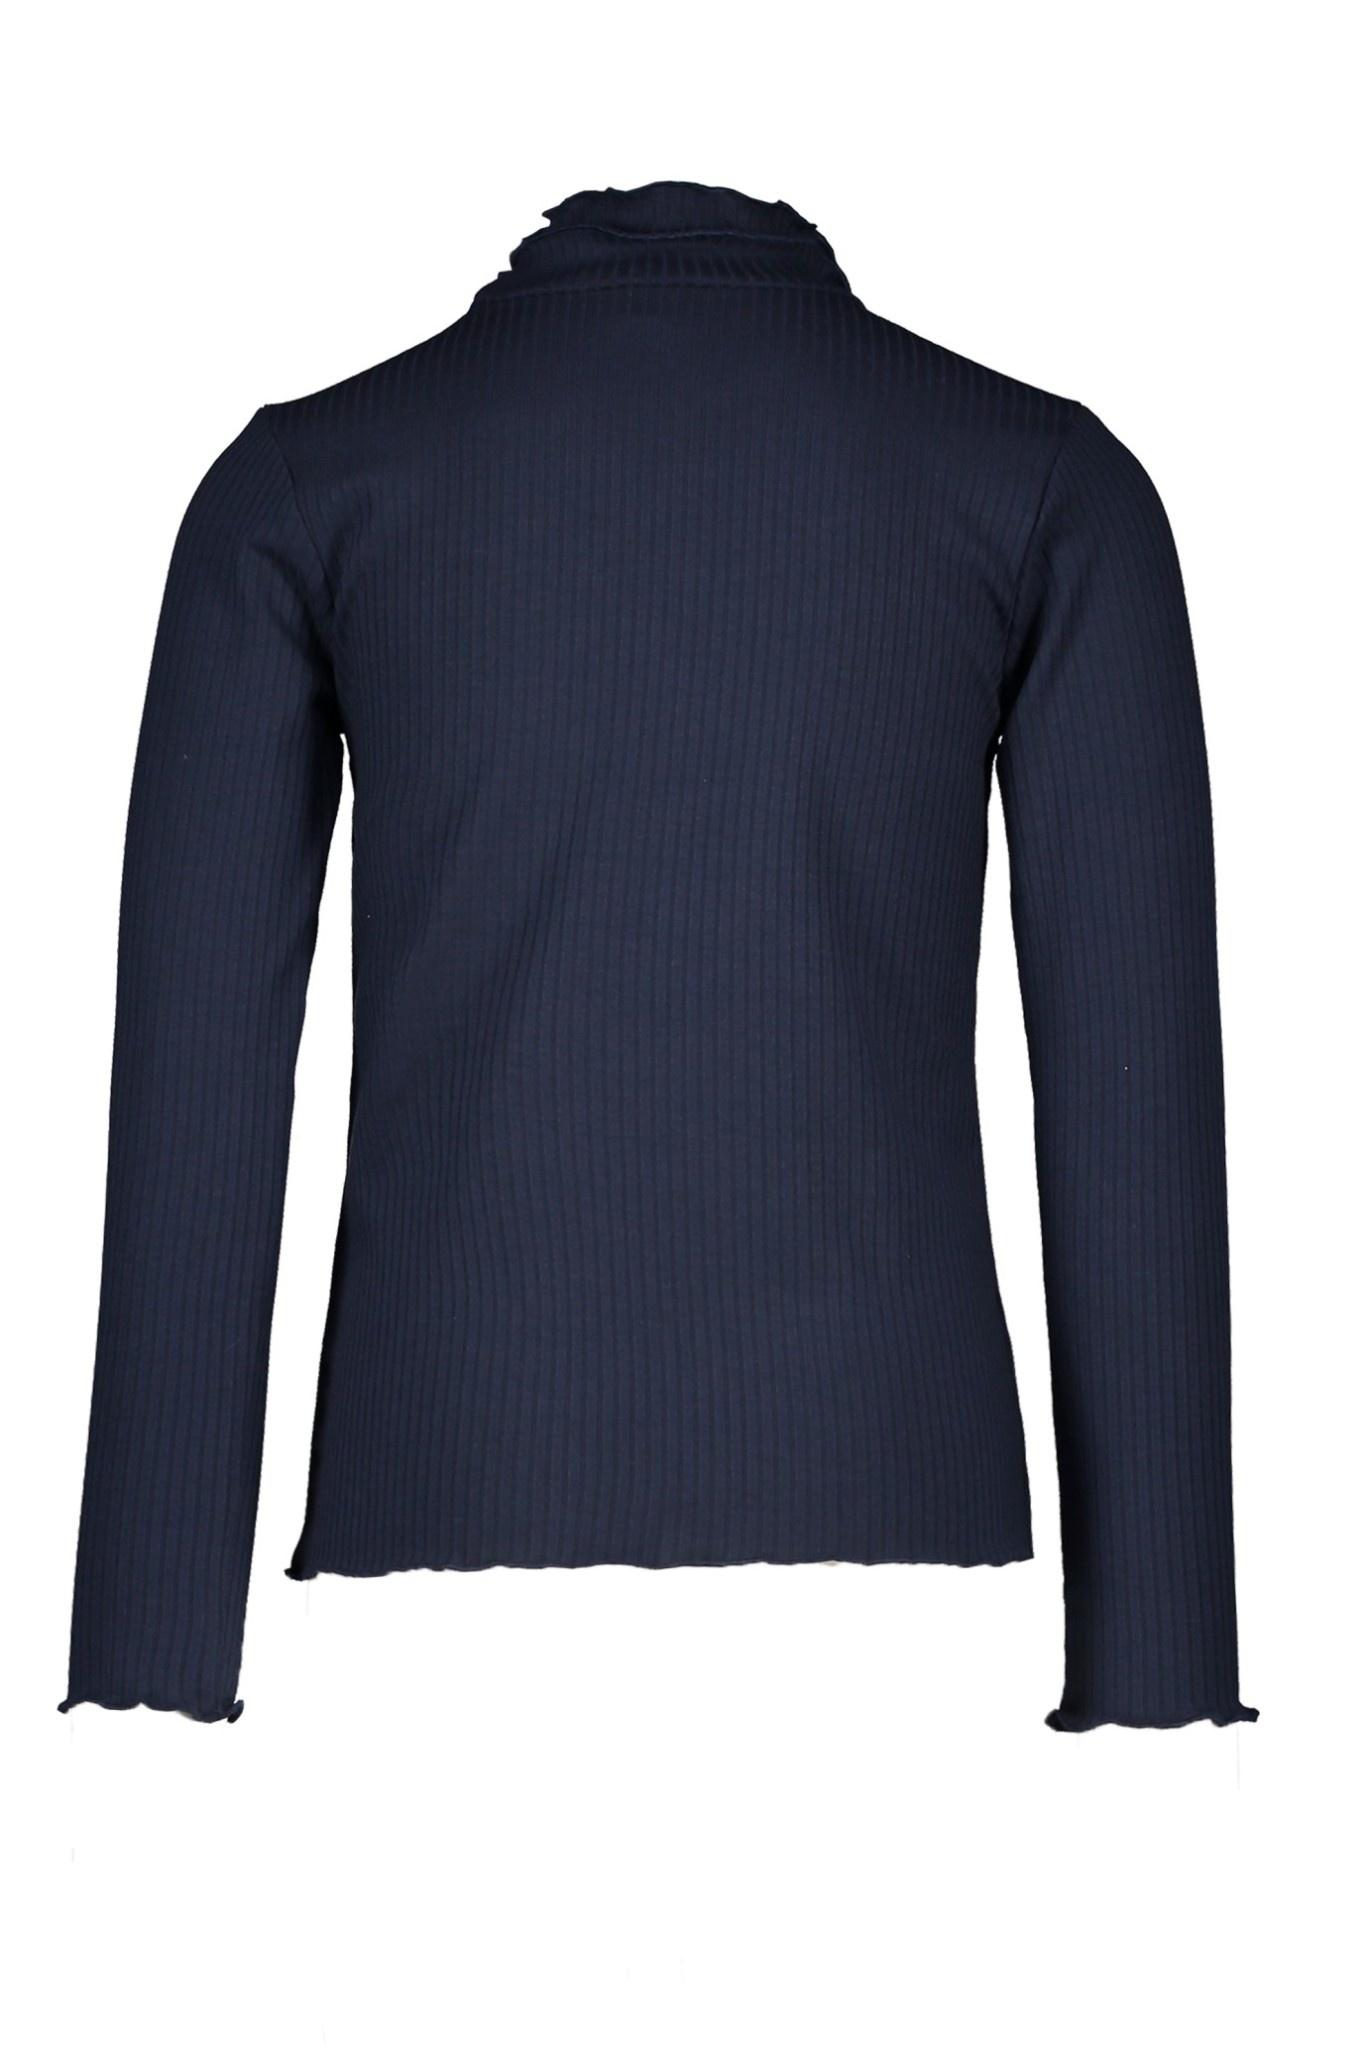 Nola Rib Turtleneck Top - Navy Blue